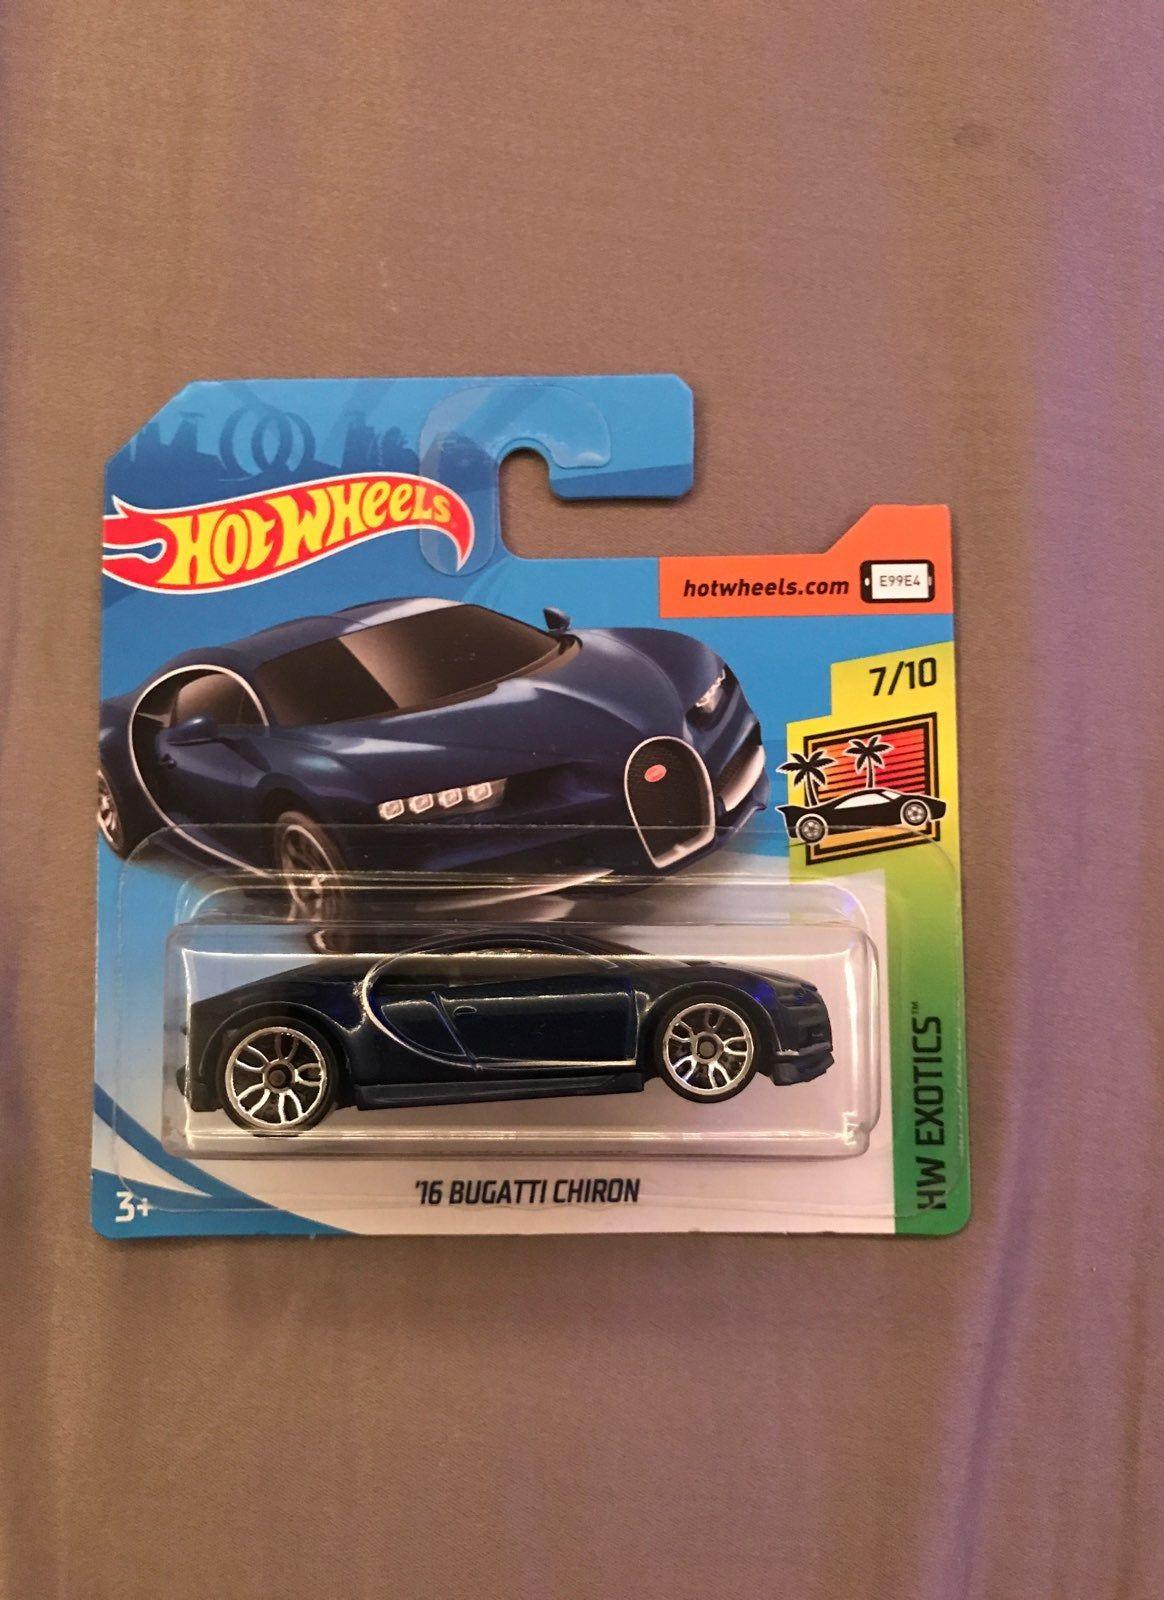 2019 Hot Wheels Bugatti Chiron Hot Wheels Garage Hot Wheels Hot Wheels Display